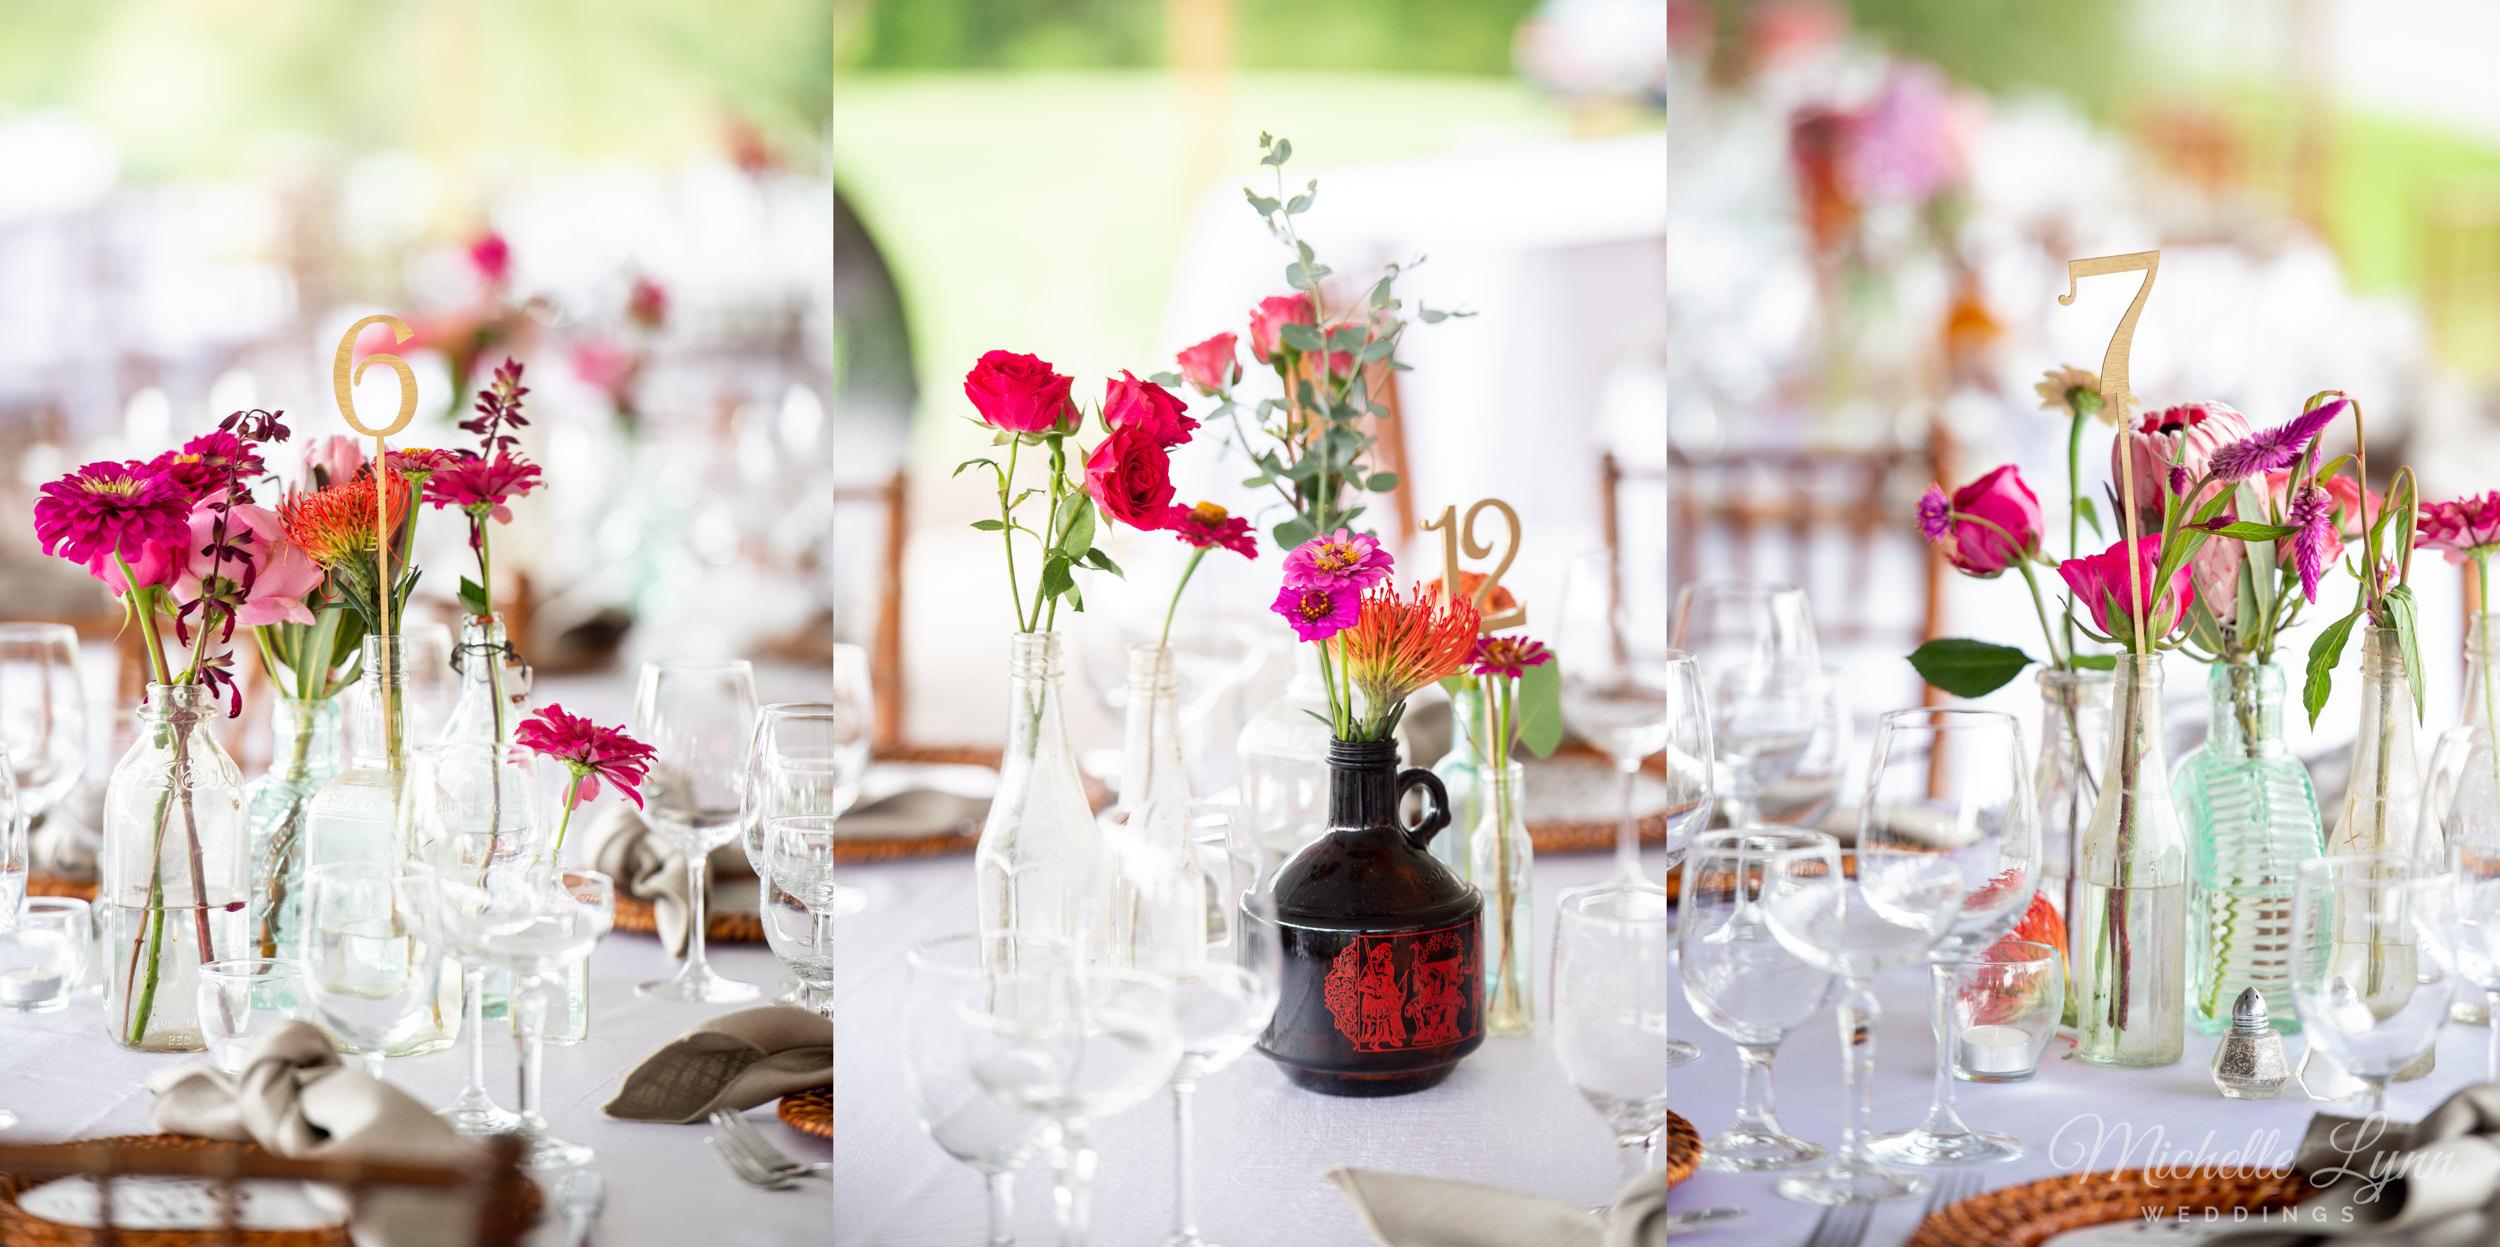 mlw-unionville-vineyards-nj-wedding-photography-72.jpg